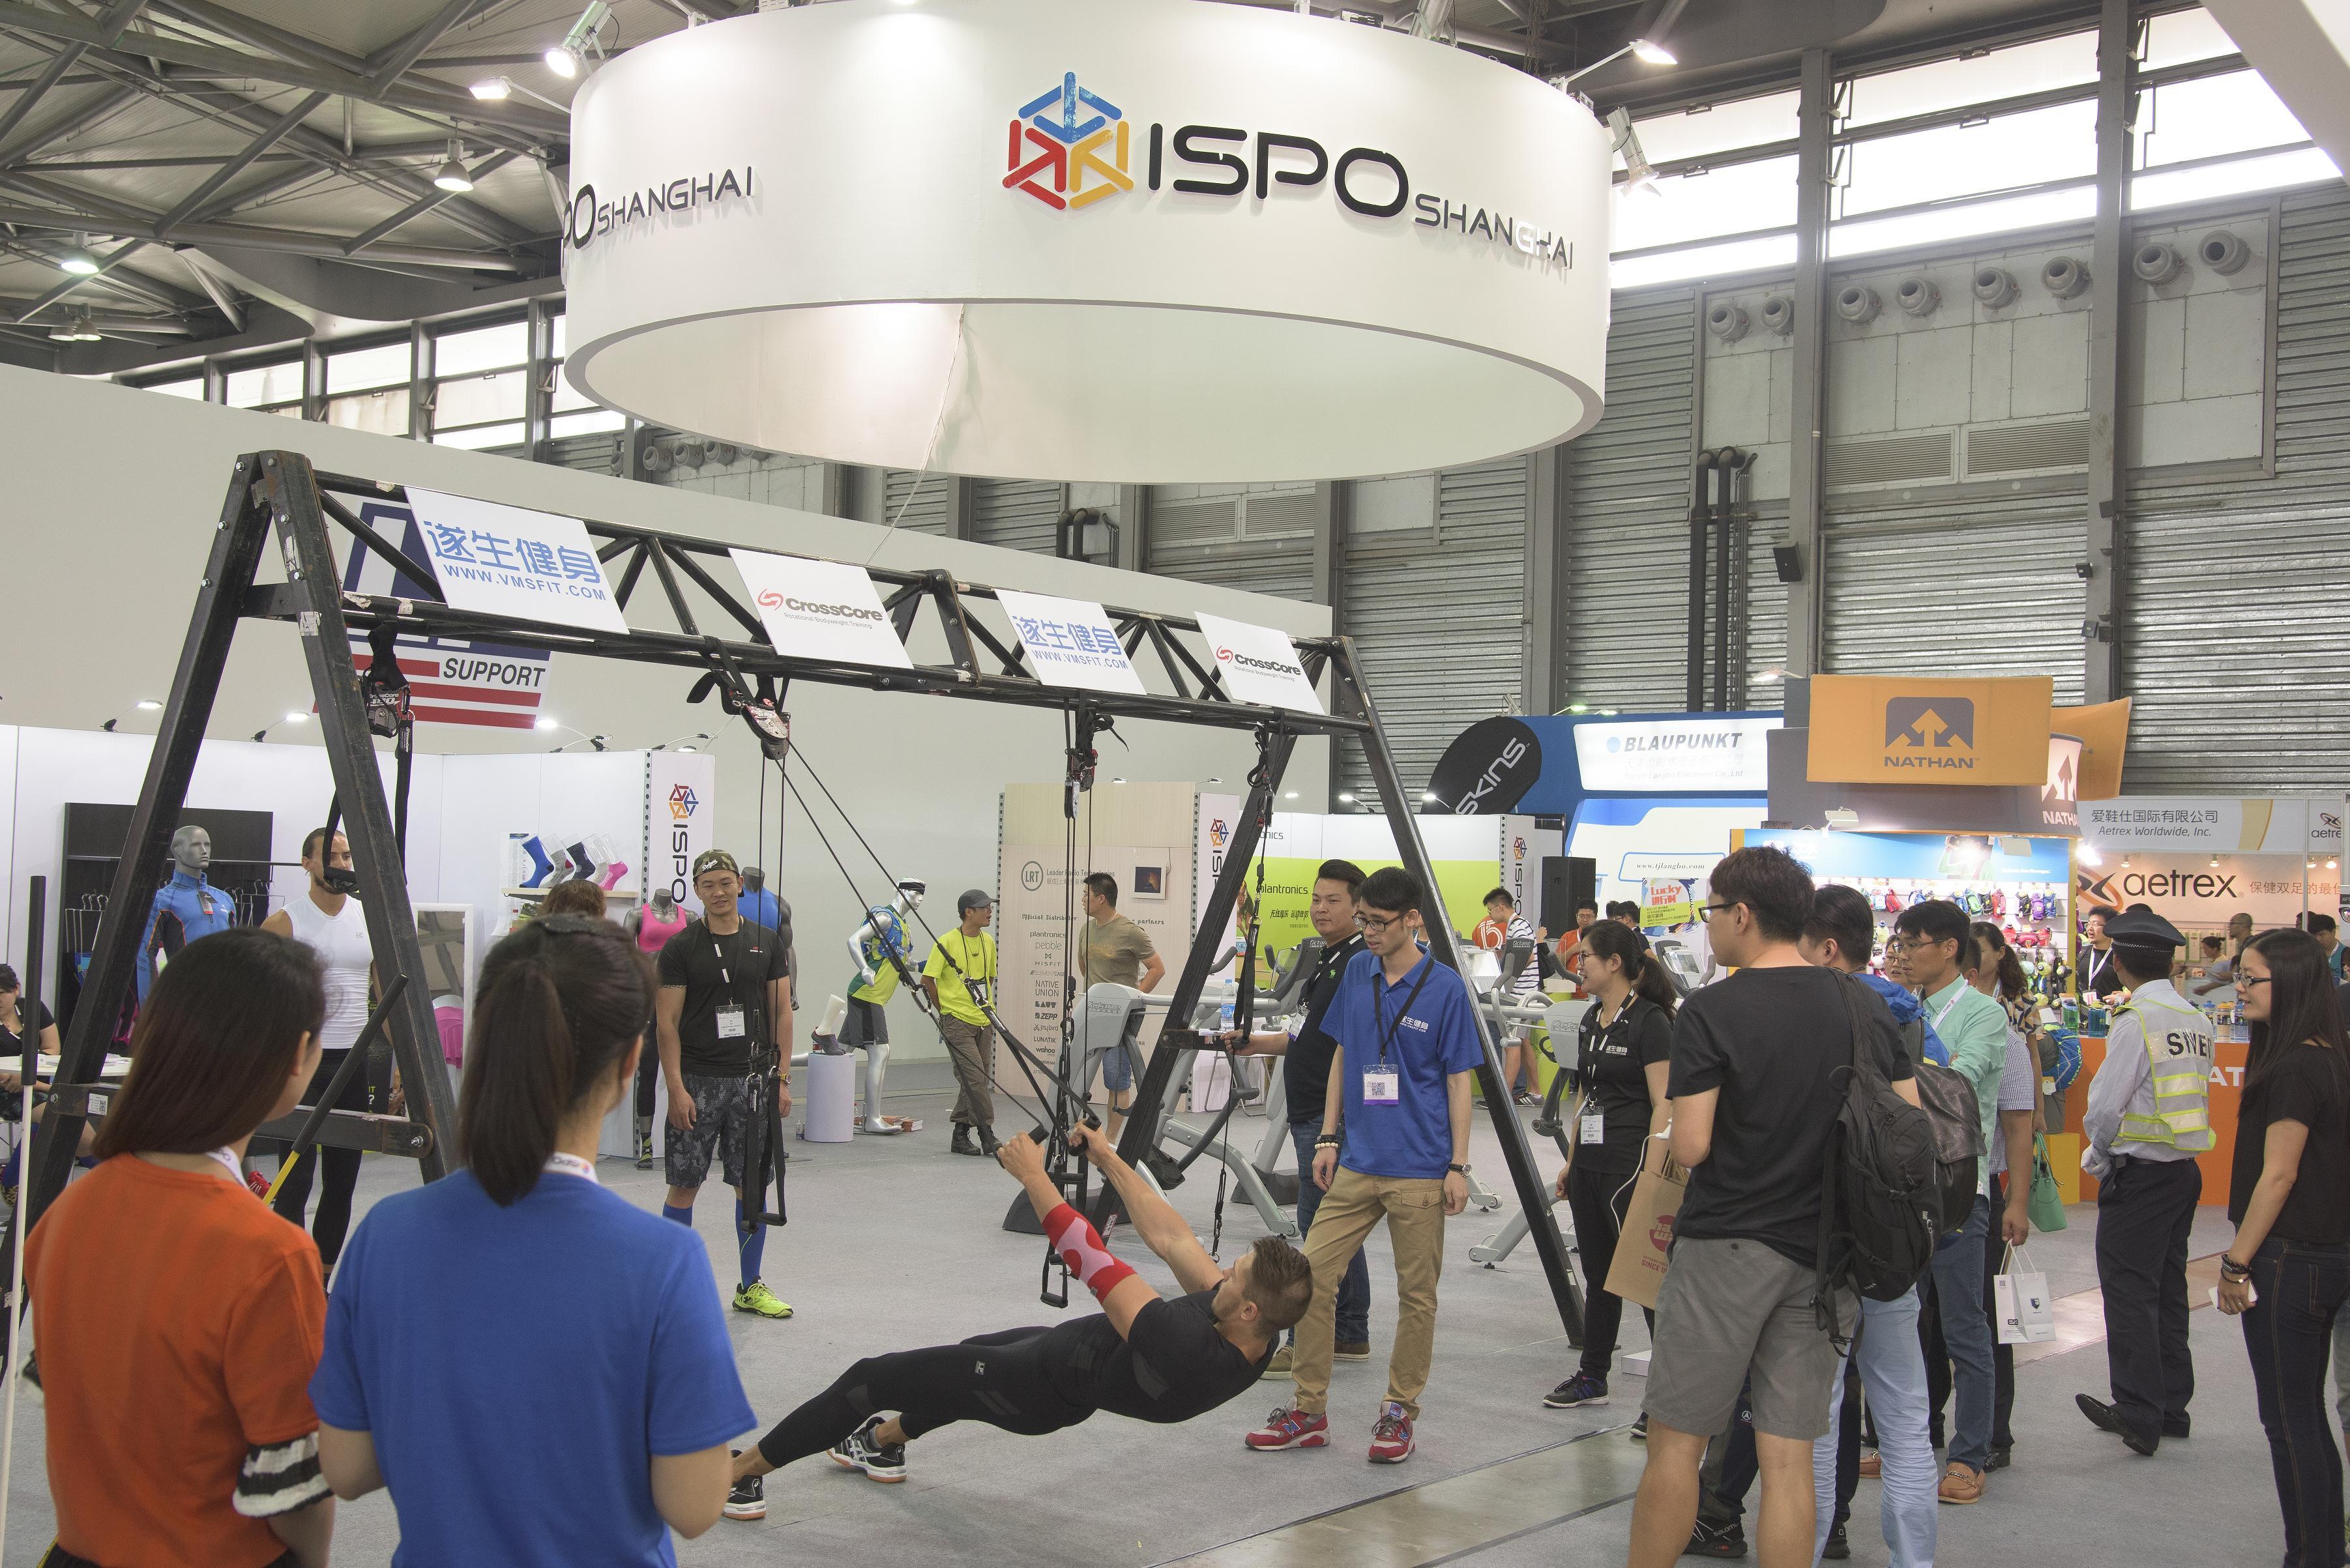 ISPO, ISPO Shanghai, ISPO Beijing, salones de material deportivo, deporte en China